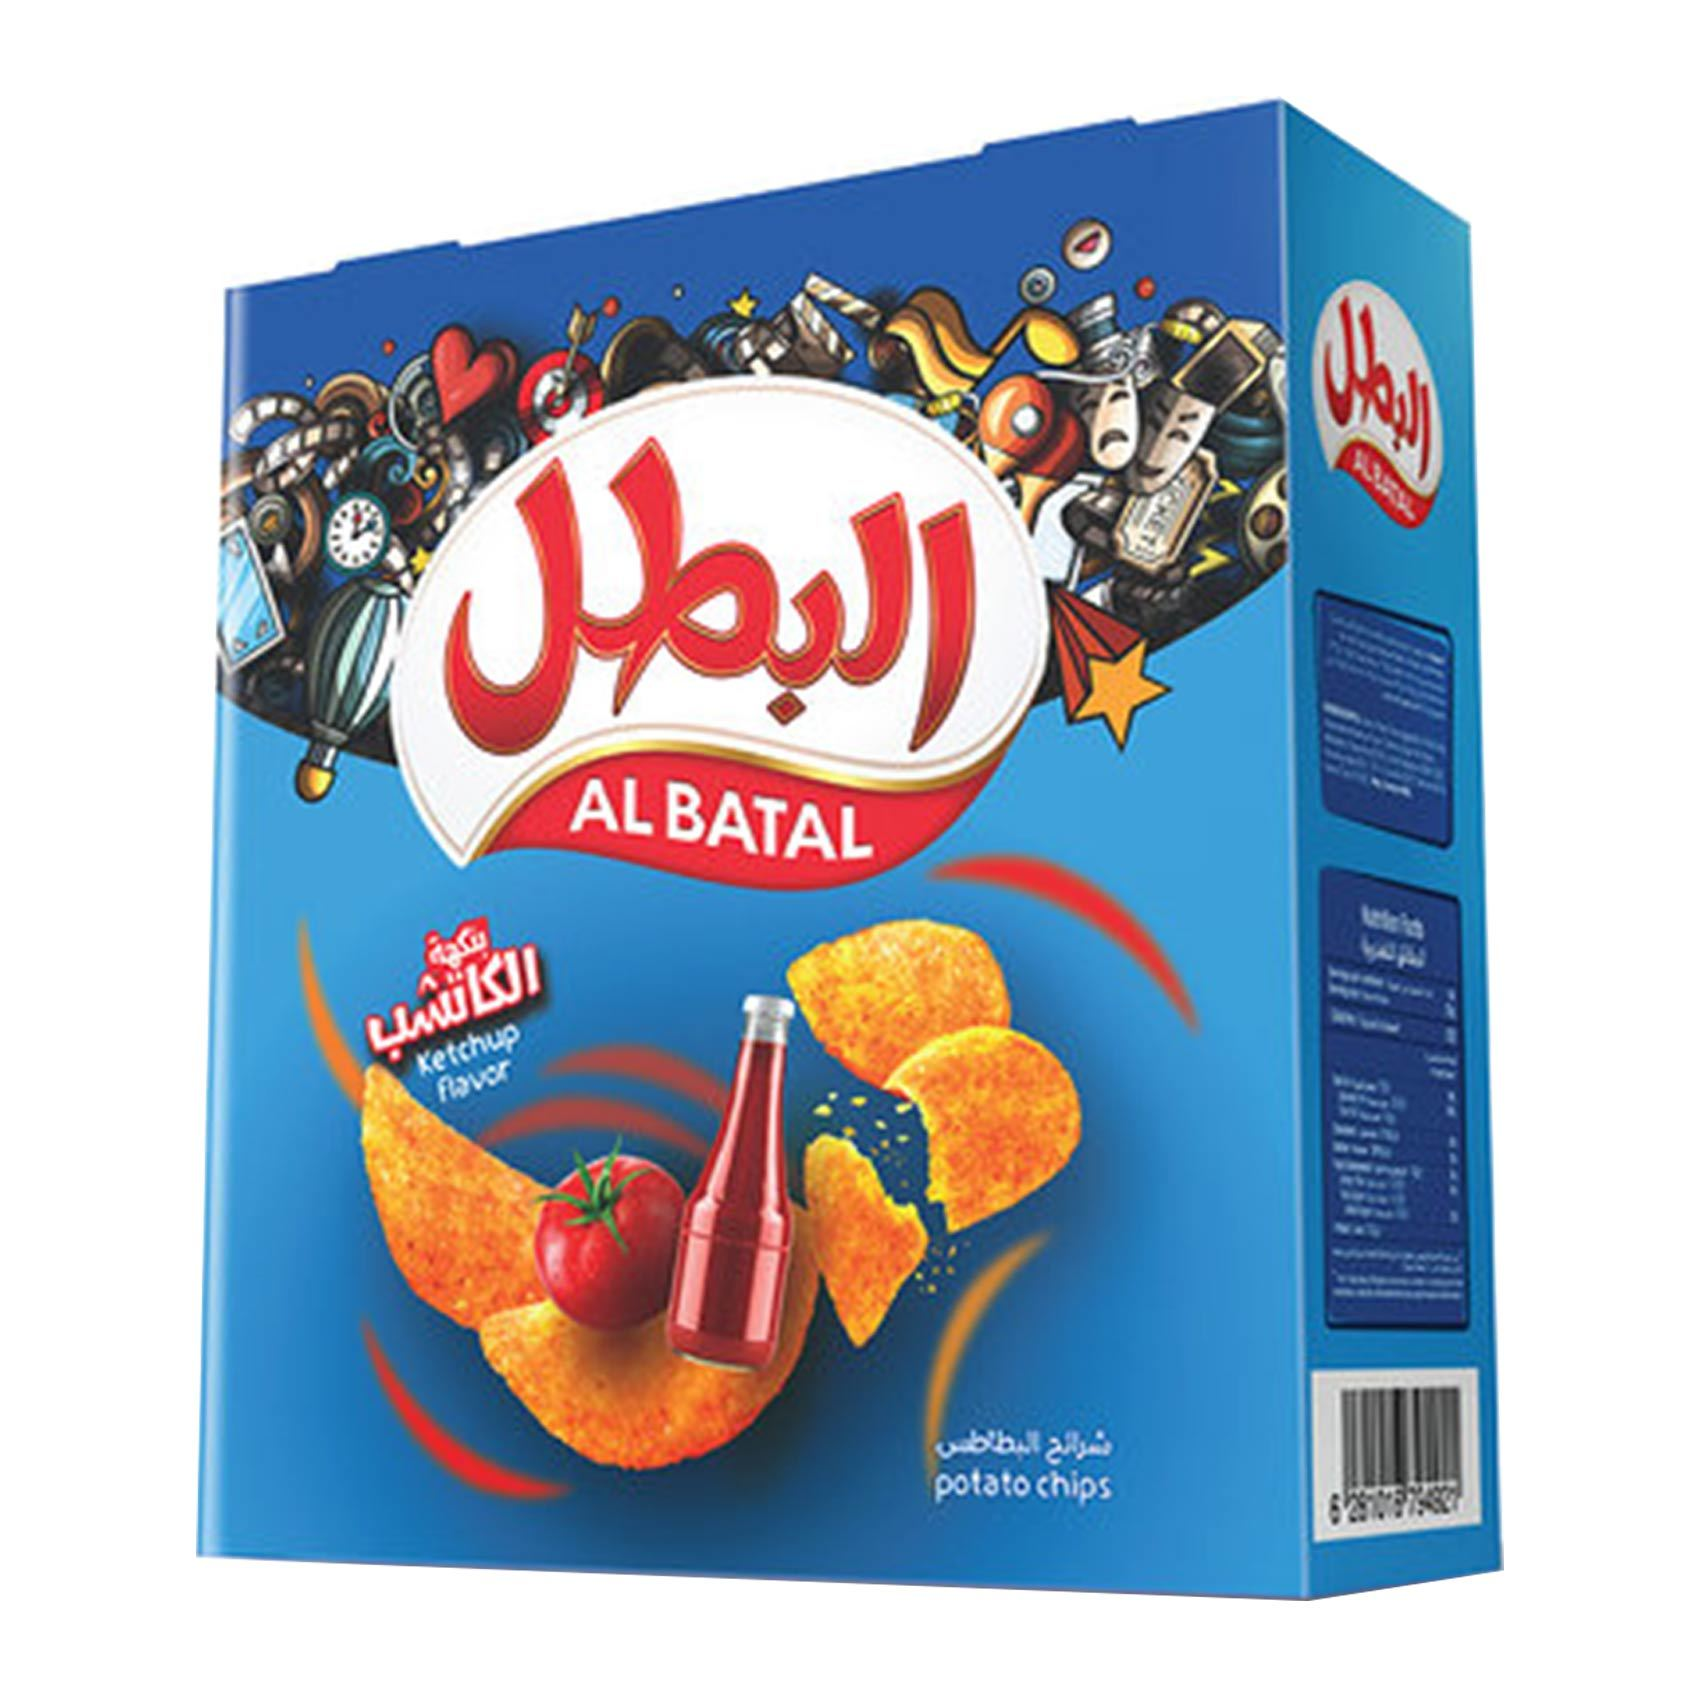 Buy Al Batal Chips Ketchap 23 G Times 14 Online Shop Food Cupboard On Carrefour Saudi Arabia